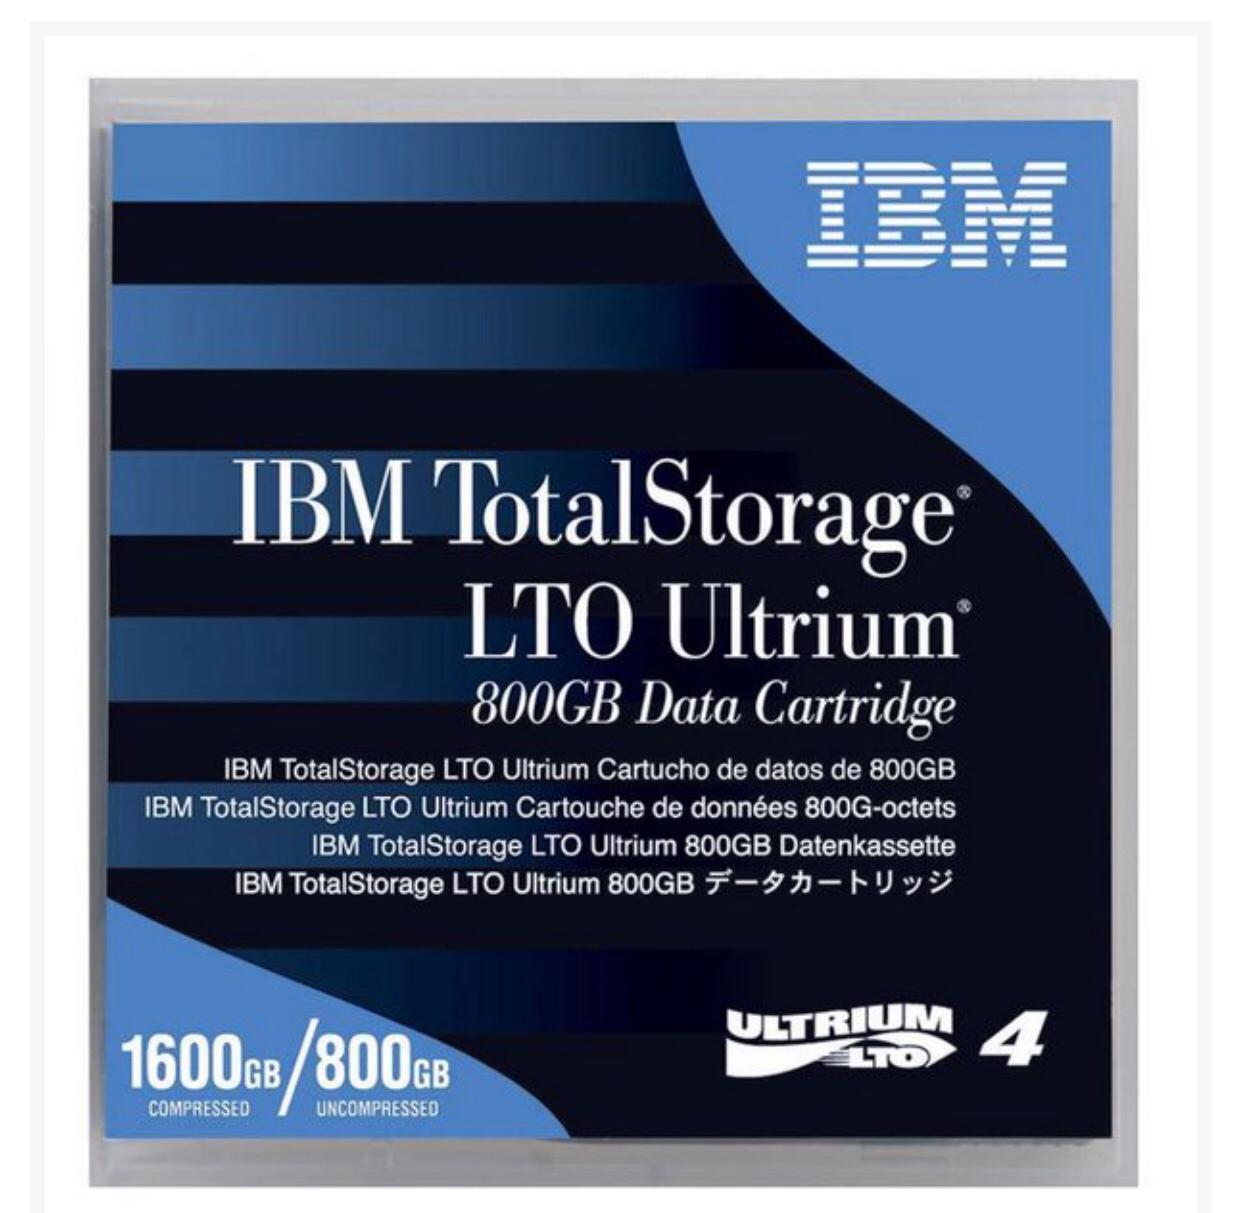 Fita LTO-4 Ultrium 4 Data Cartridge 800GB/1.6TB IBM